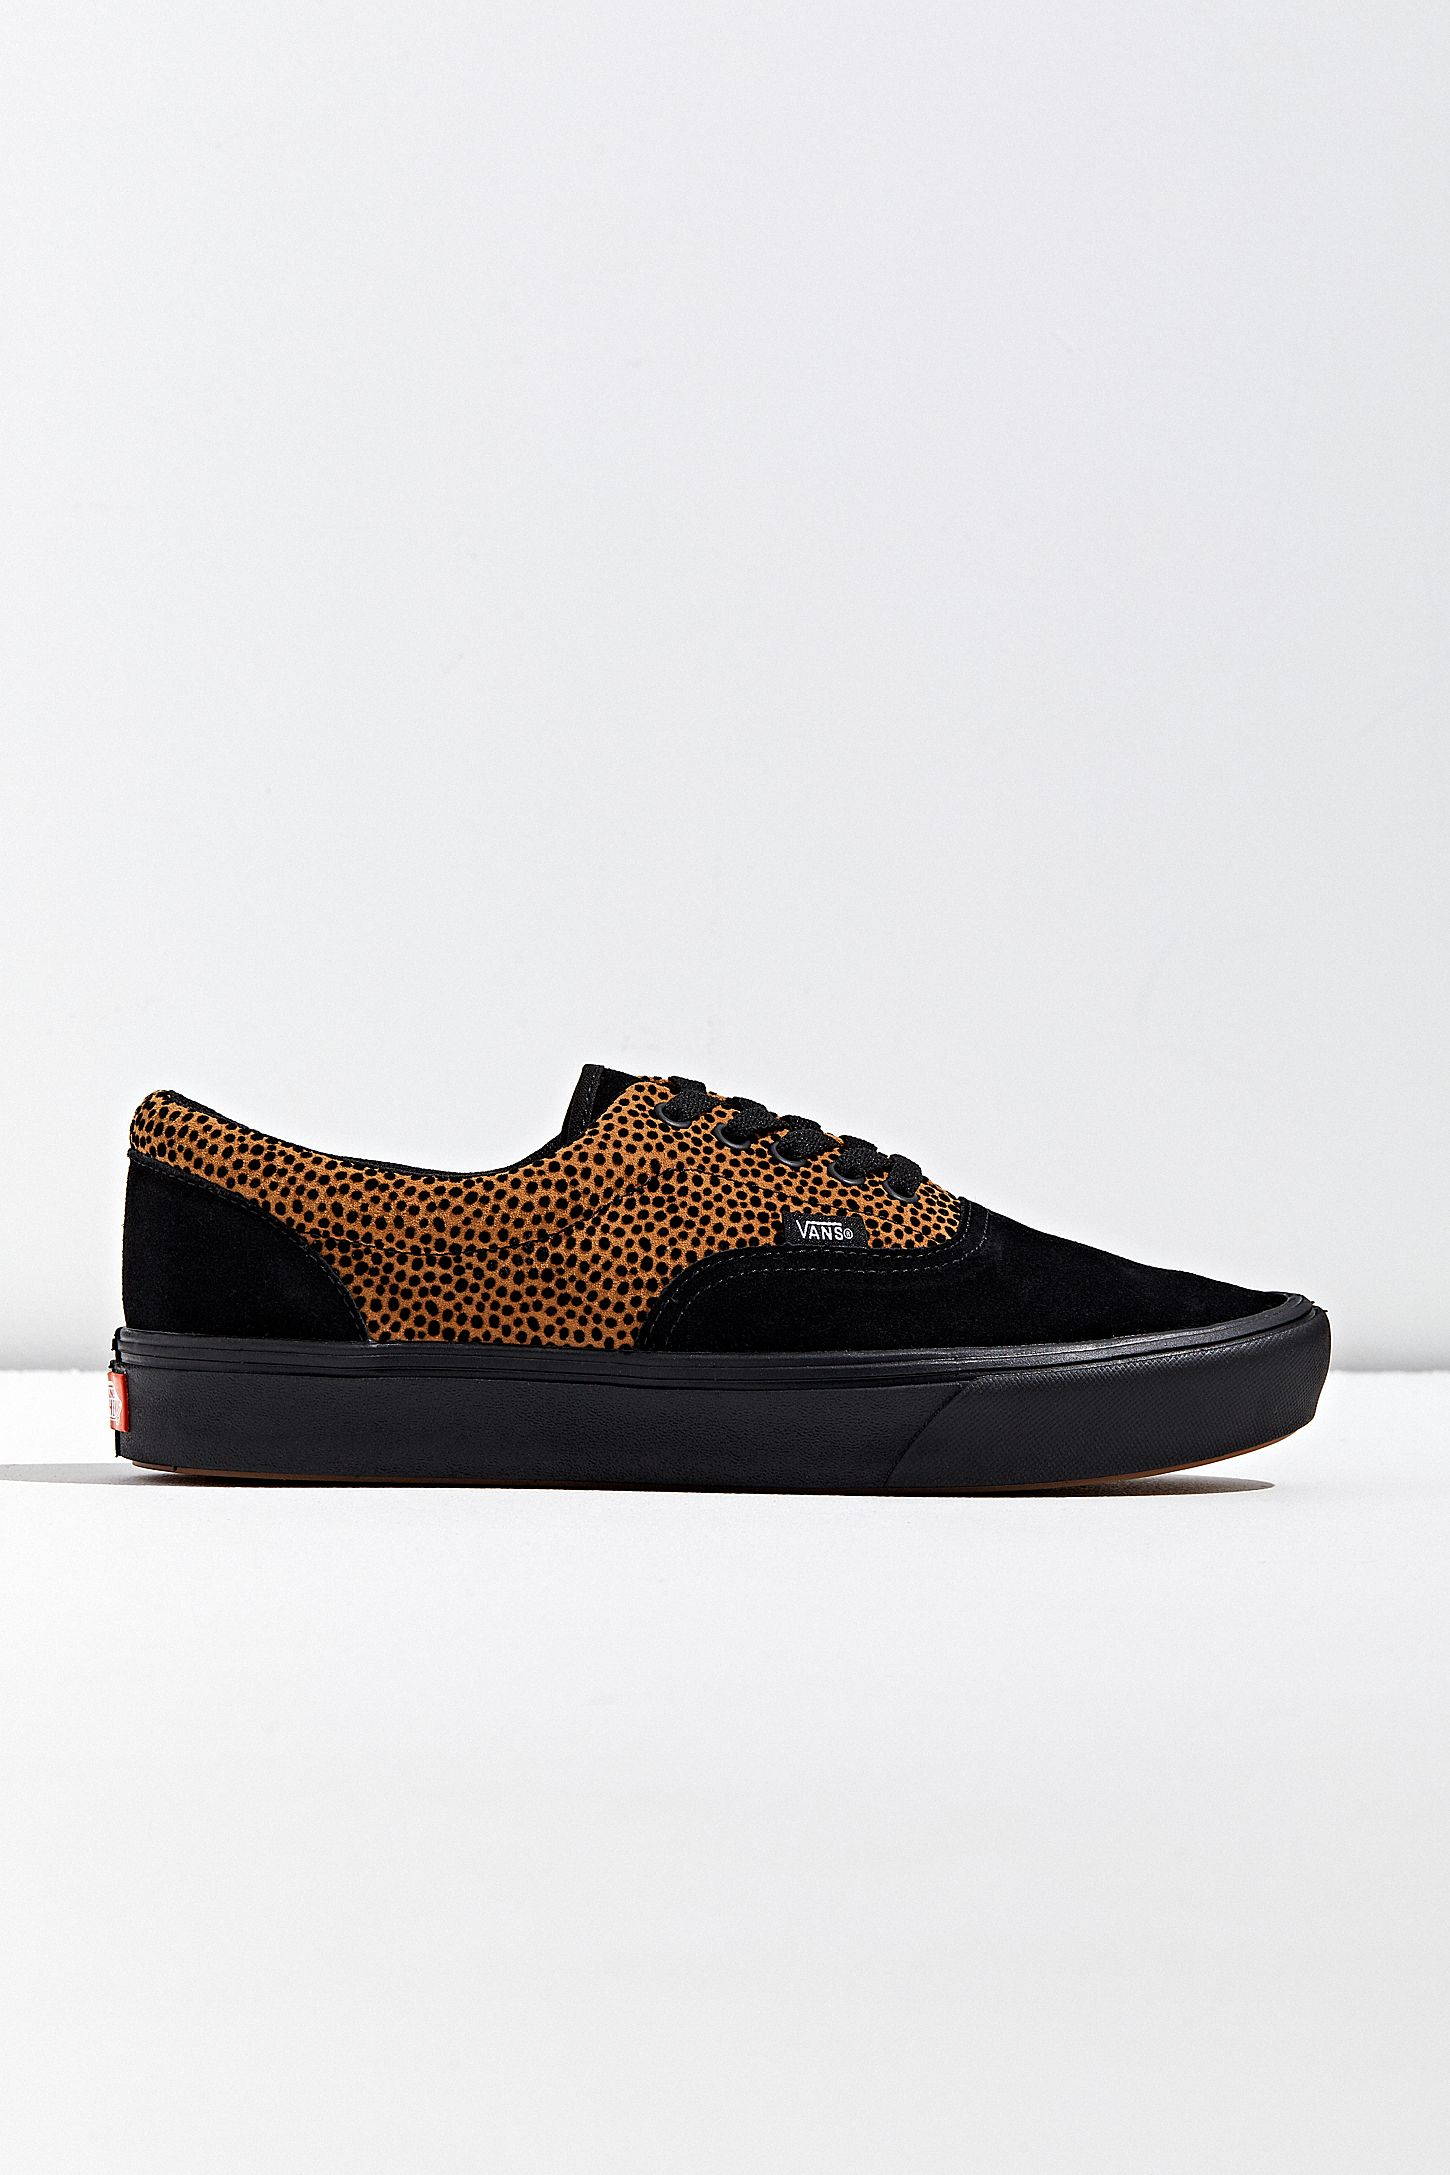 Vans Era Tiny Cheetah ComfyCush Sneaker